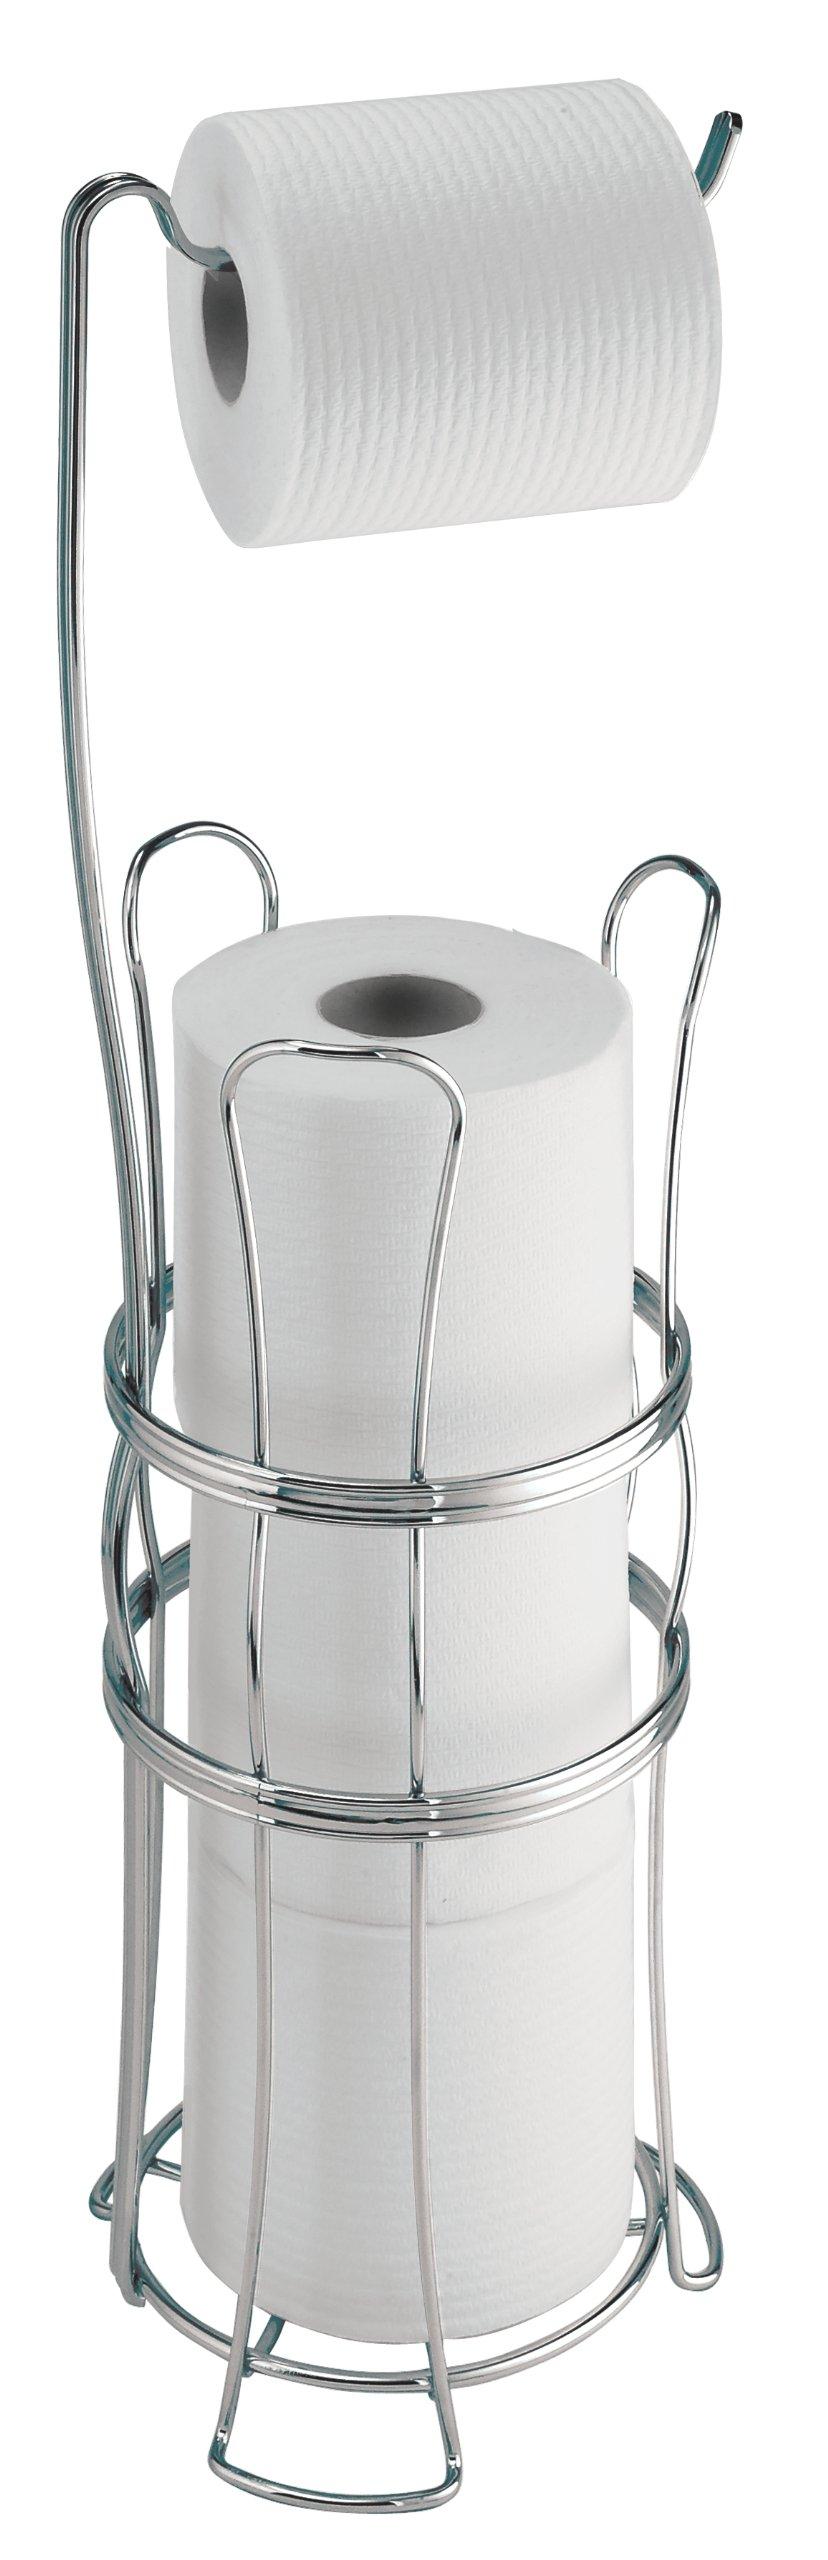 InterDesign York Lyra Free Standing Toilet Paper Holder – Dispenser and Spare Roll Storage for Bathroom, Chrome